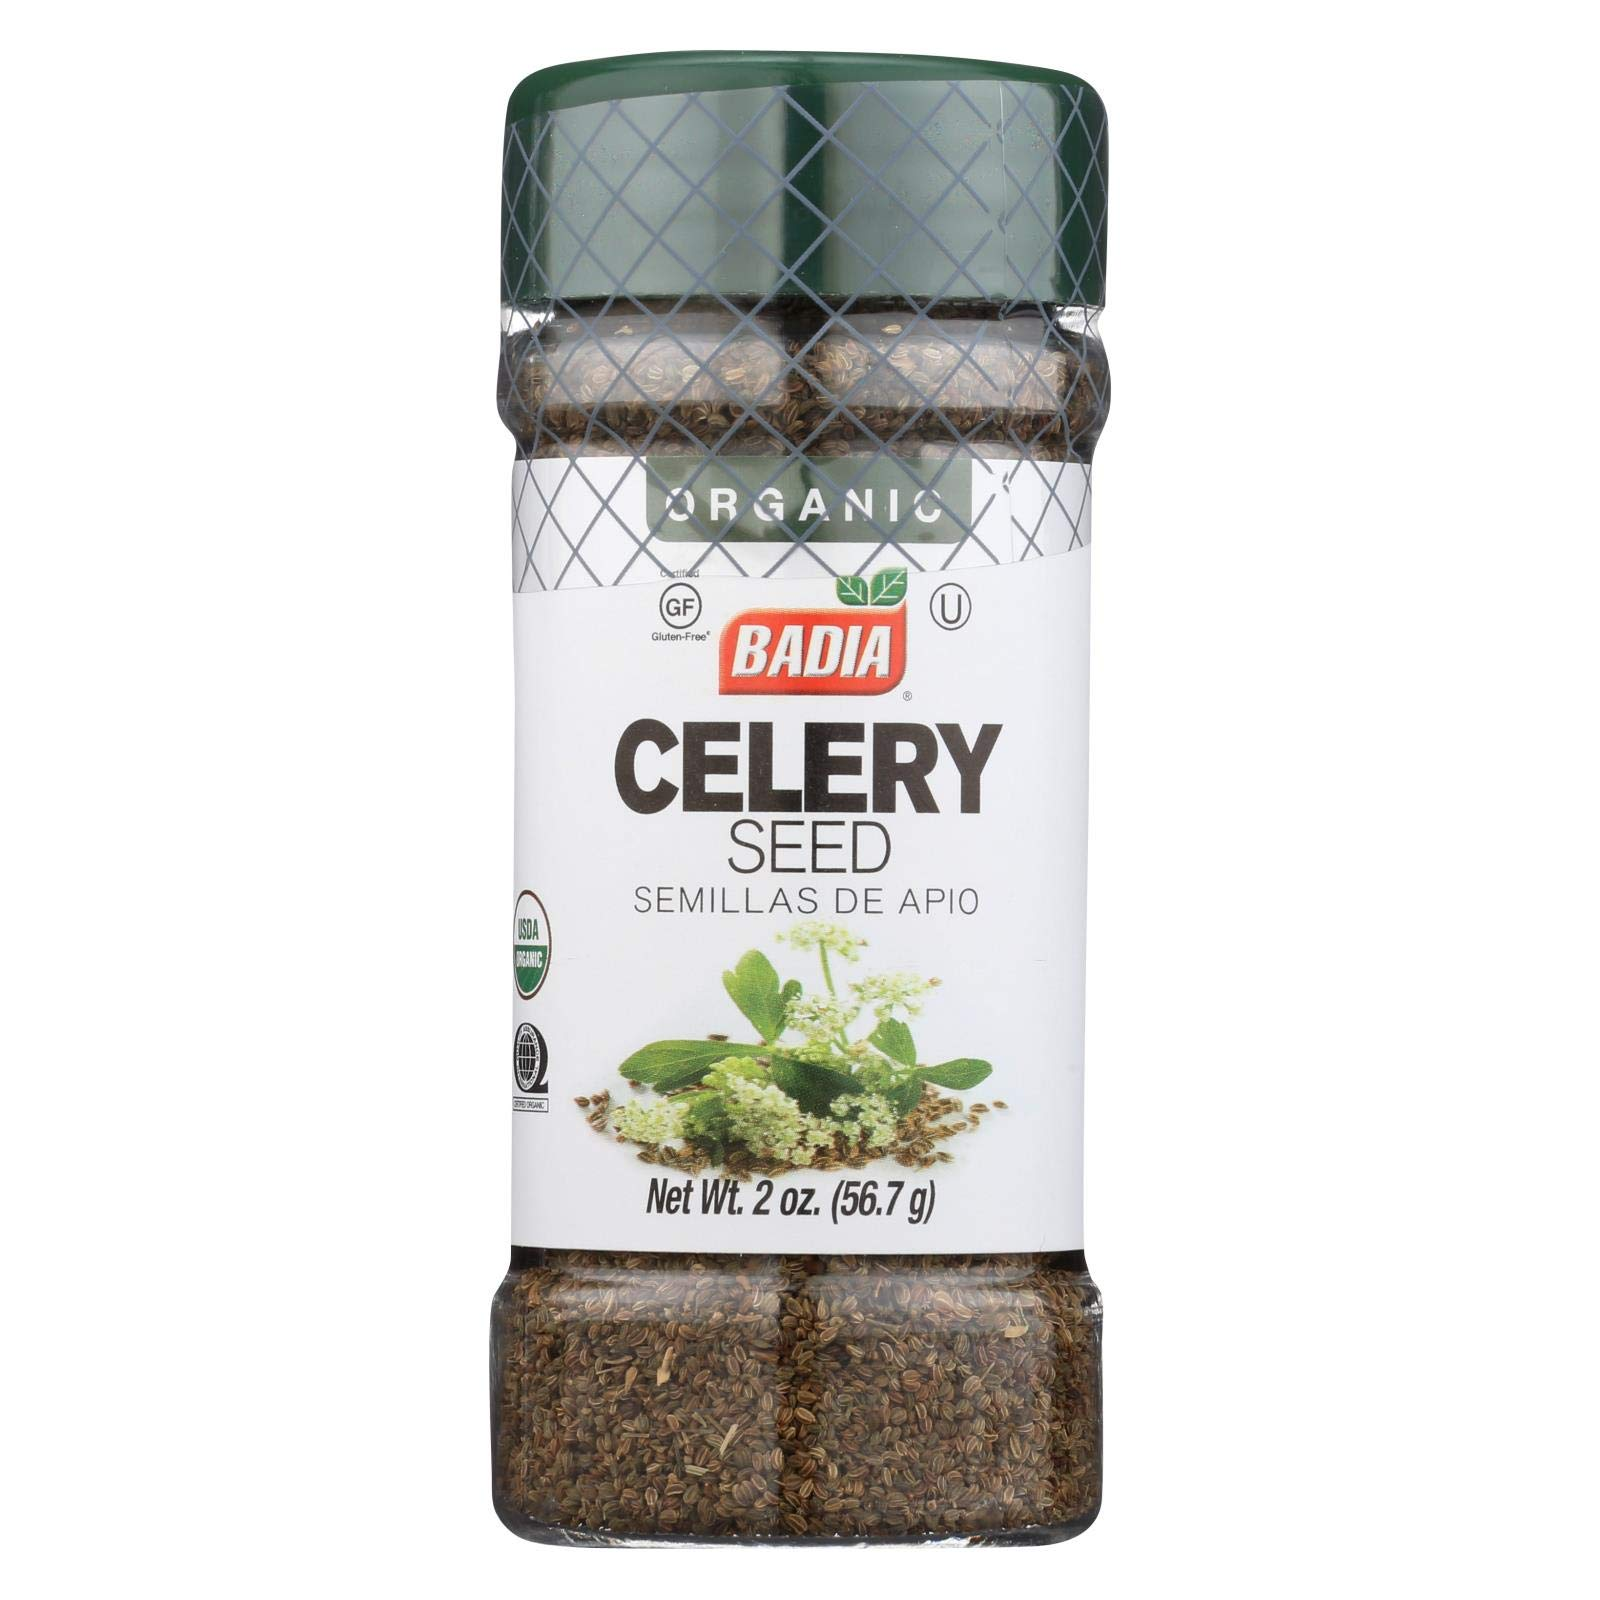 Badia Organic Celery Seed -- 2 oz